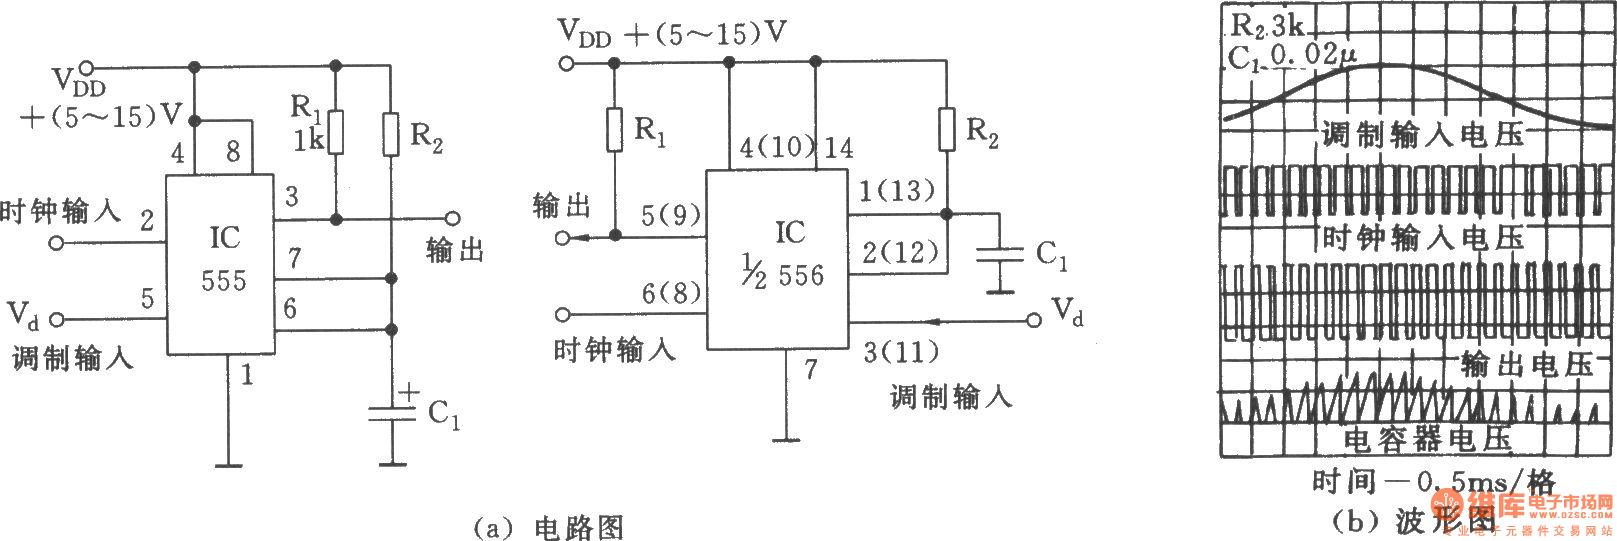 pulse width modulation circuit pdf